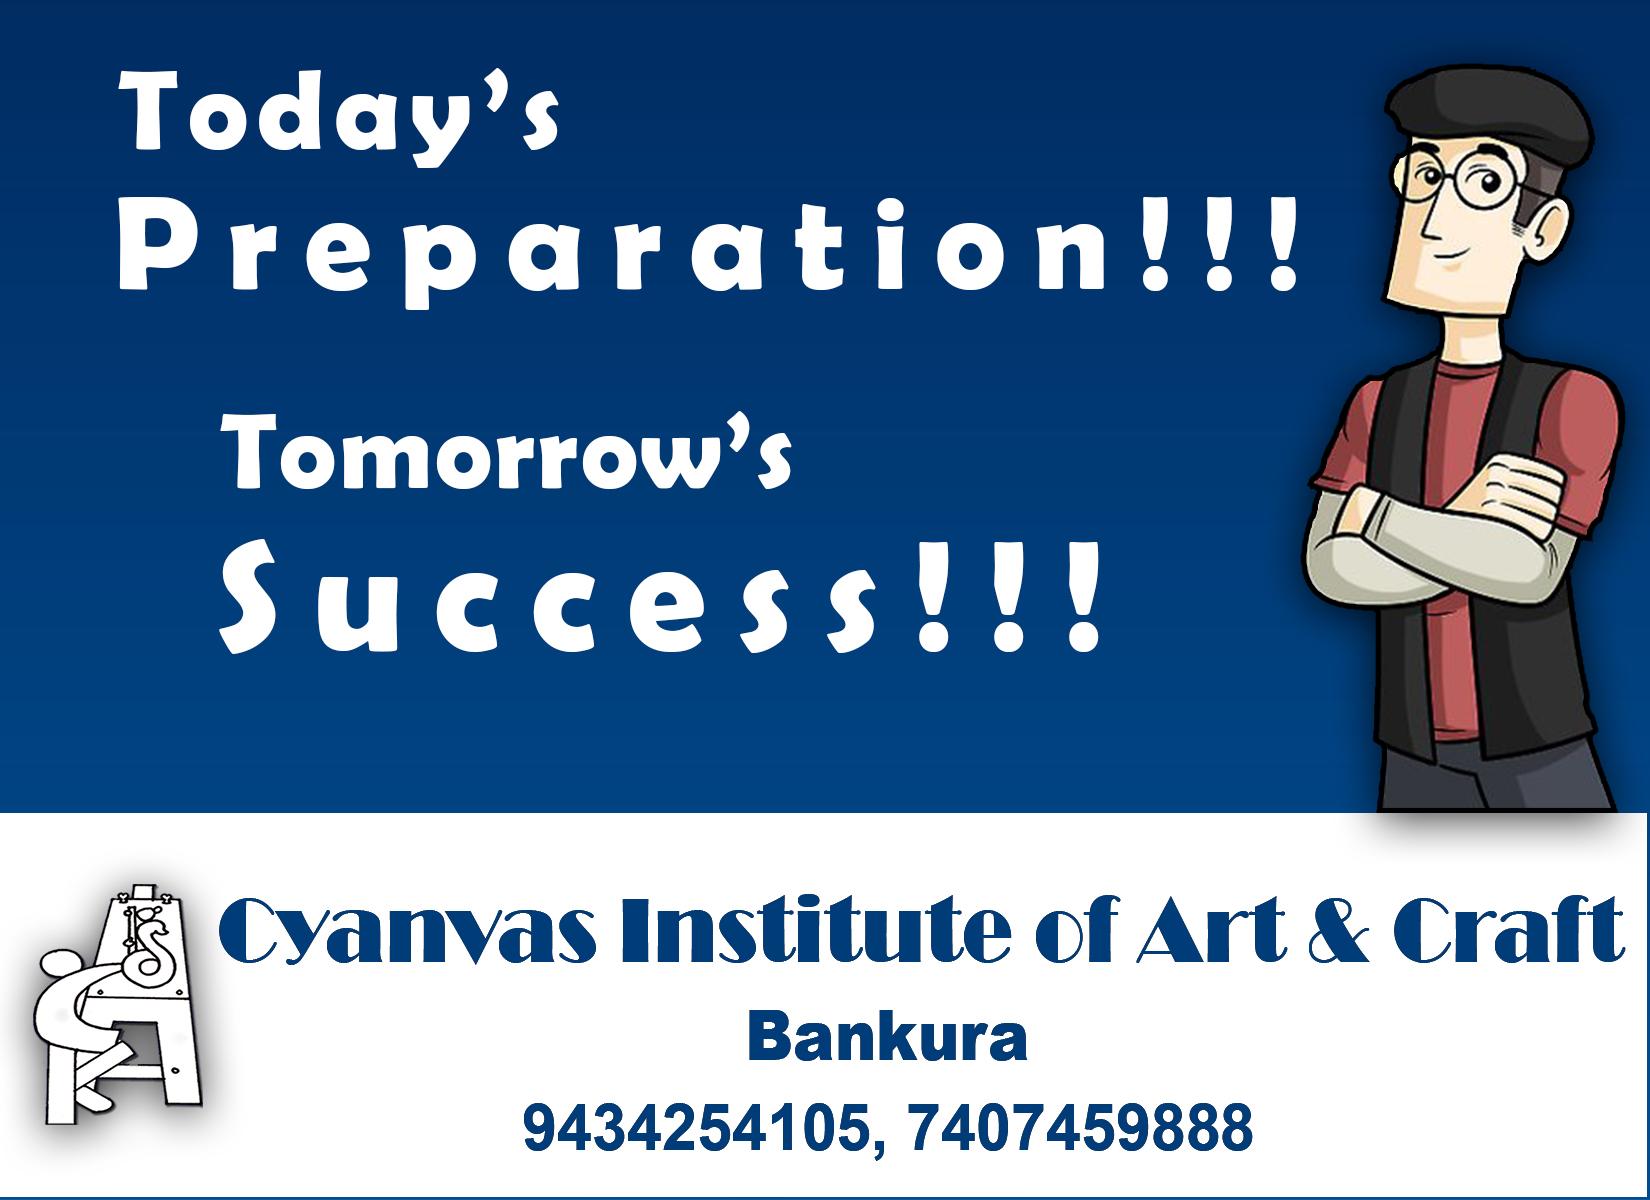 Cyanvas Institute of Art & Craft-SchoSys.com